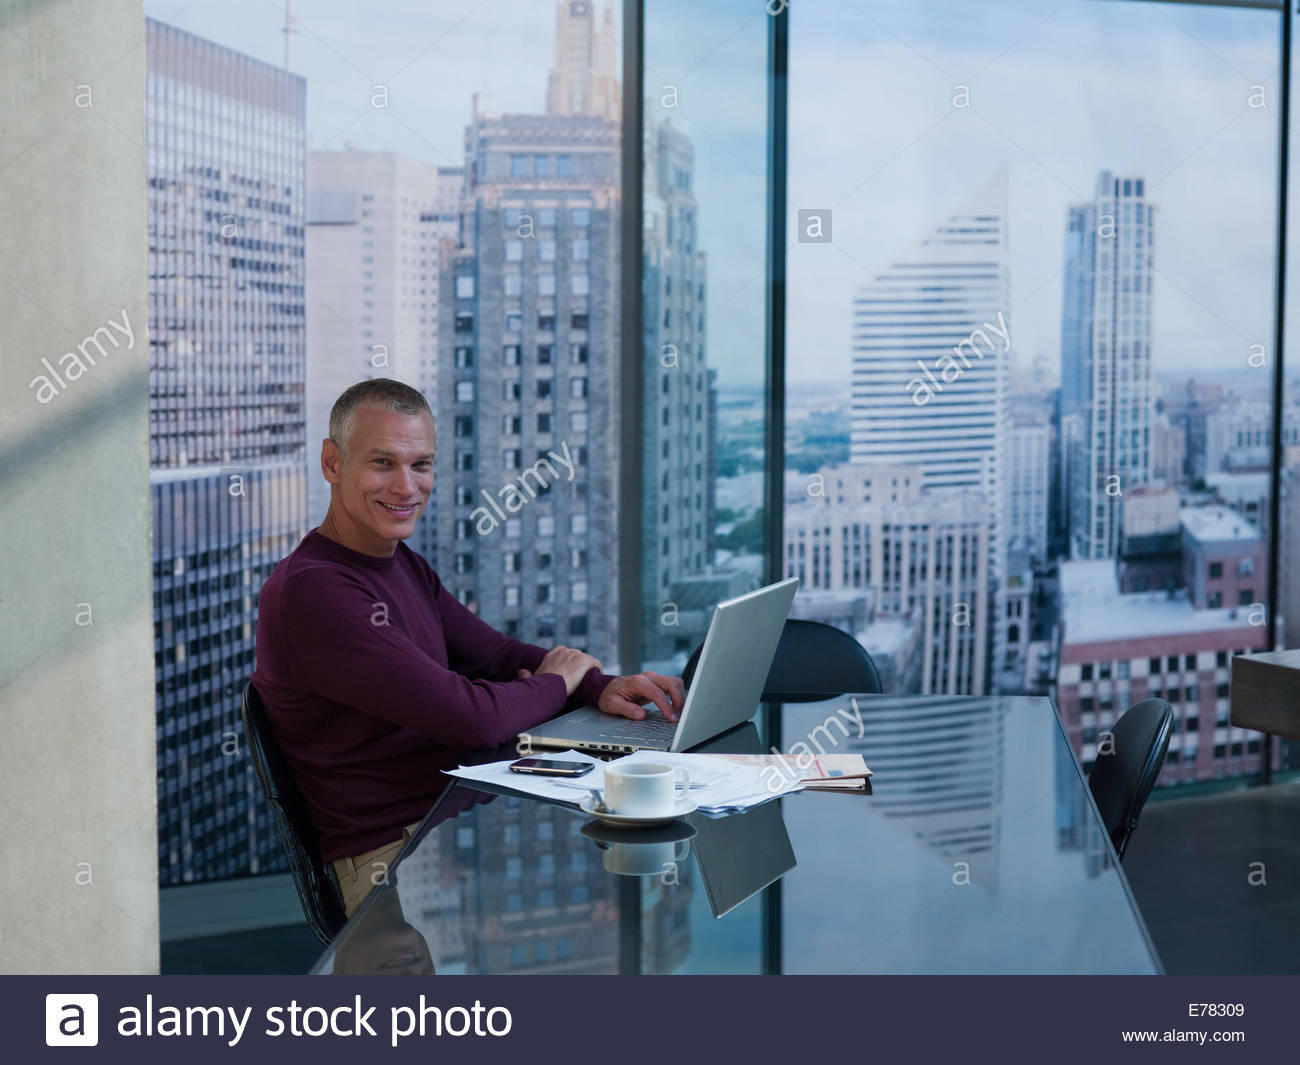 Businessman using laptop at desk - Stock Image